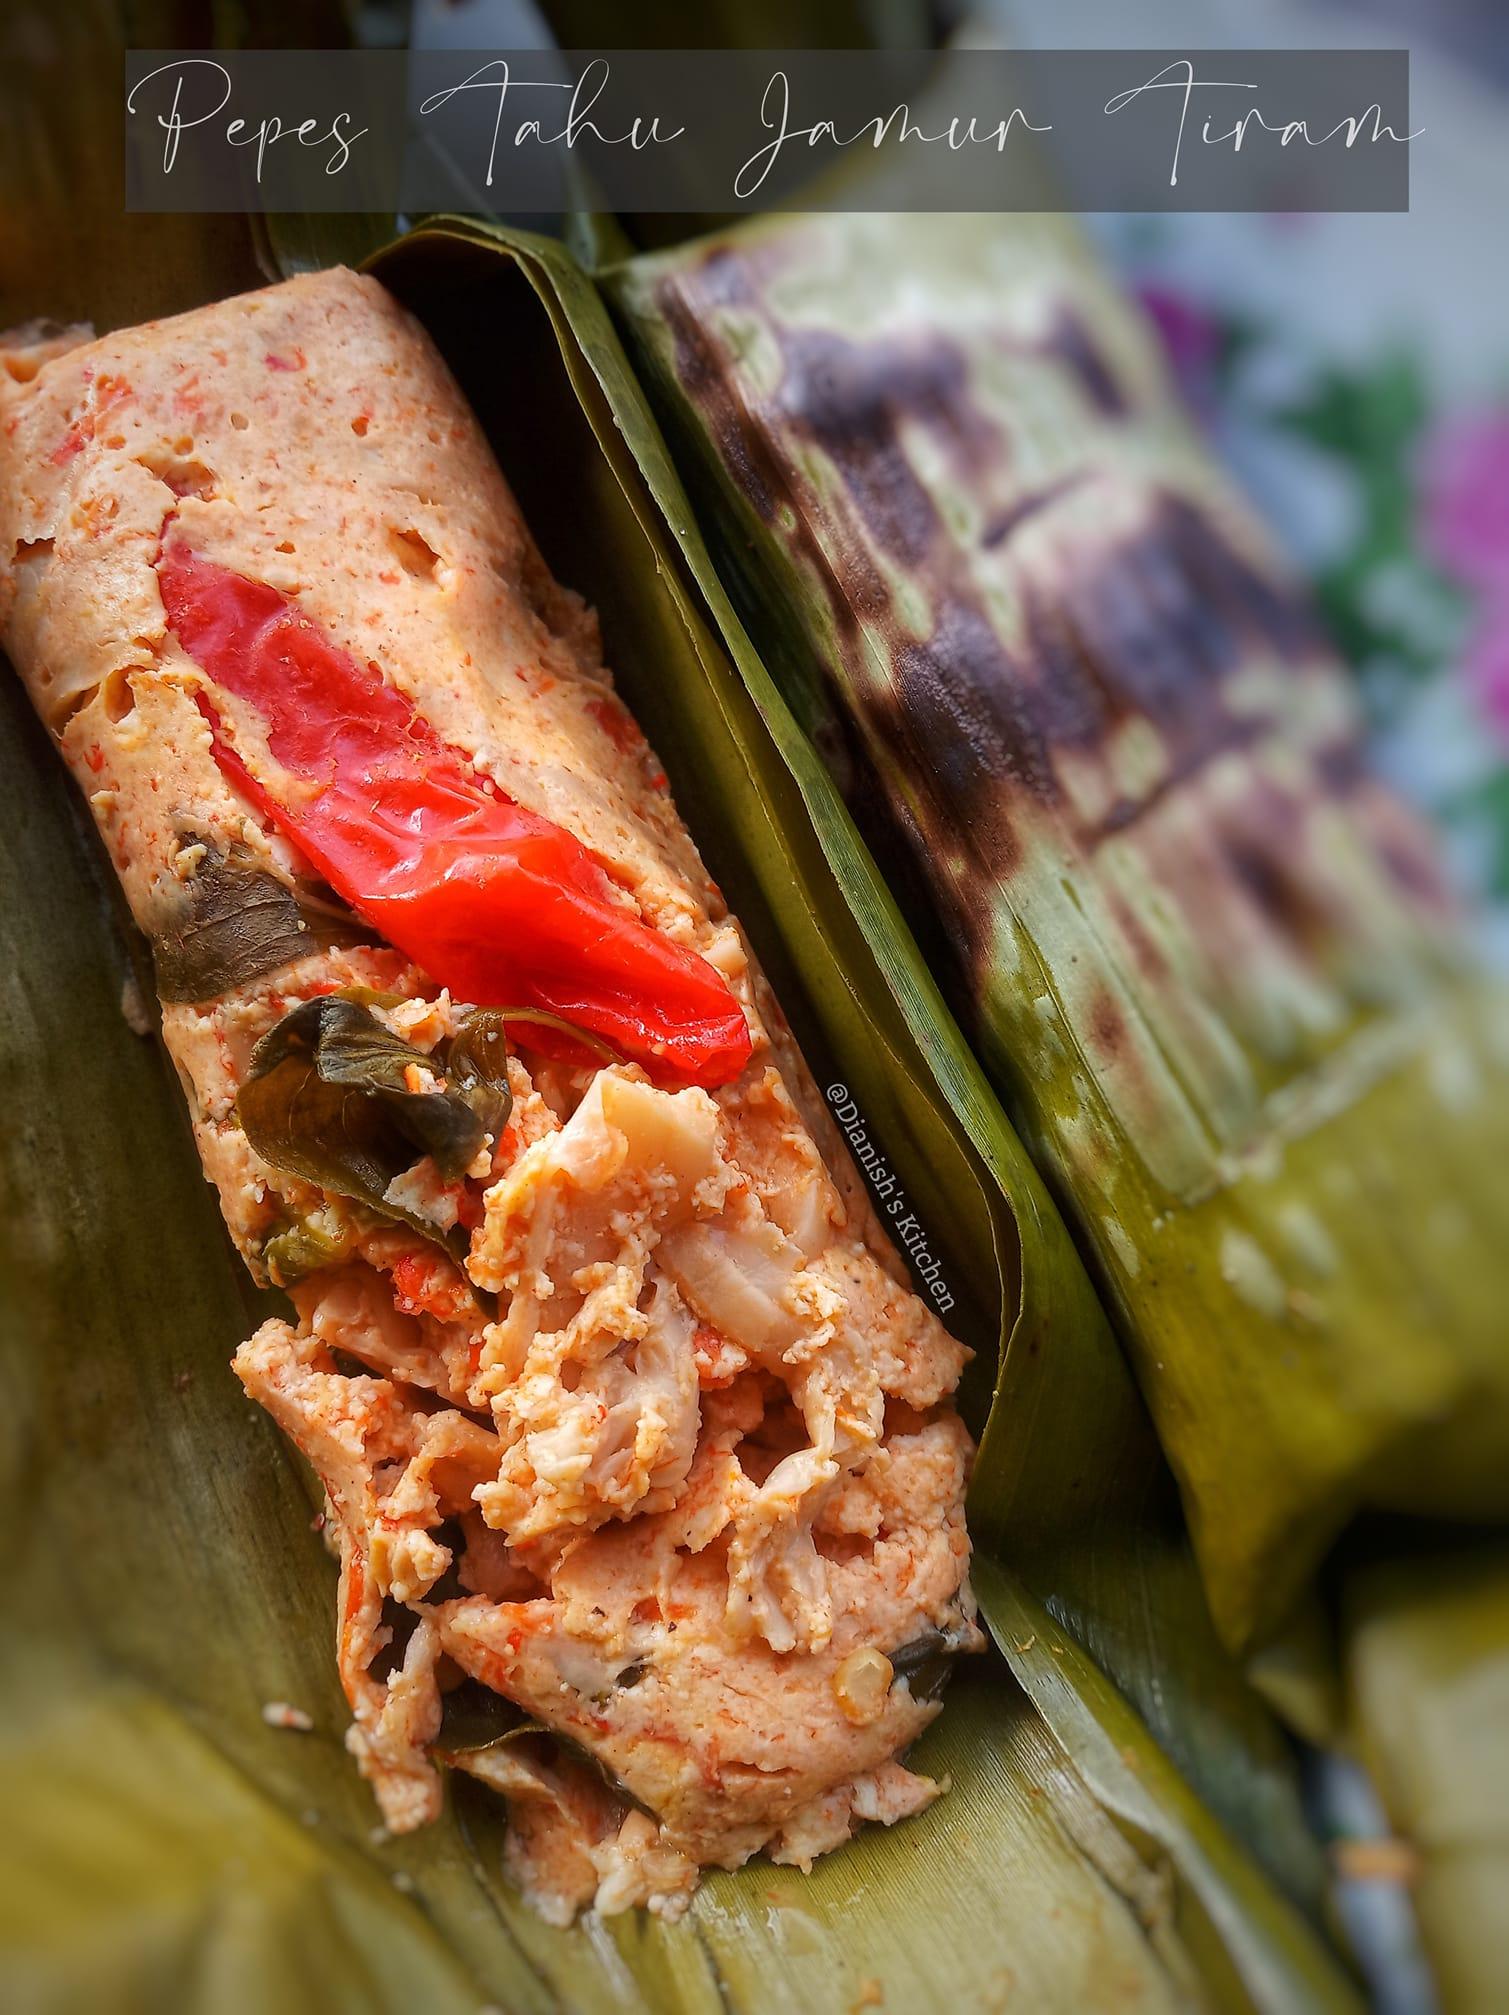 resep PEPES TAHU JAMUR TIRAM by Dianish's Kitchen